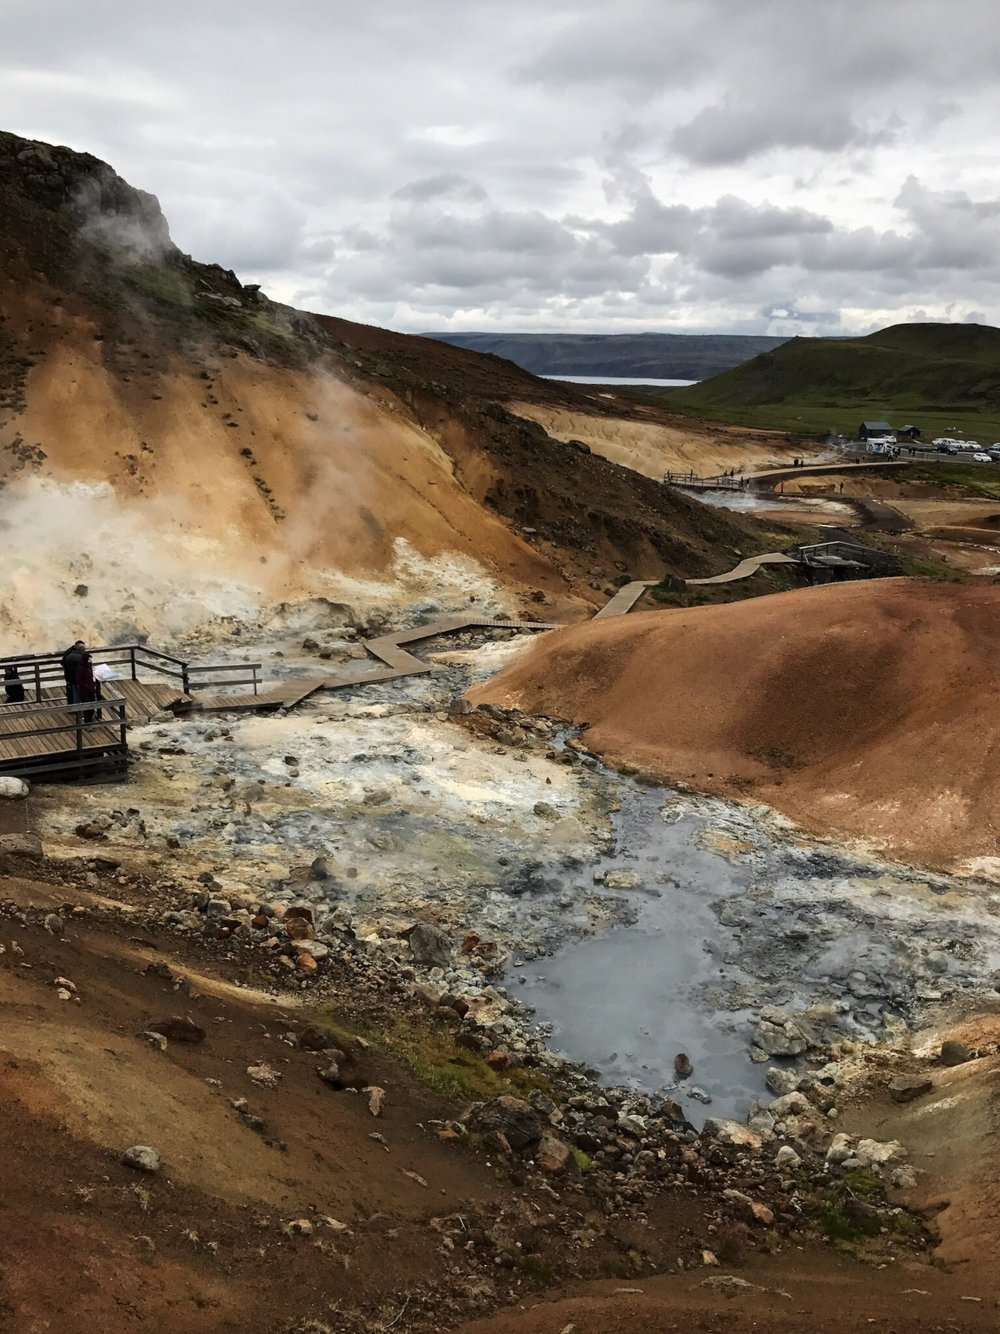 krysuvik-krýsuvík-reykjavik-nagrenni-iceland-nature-hotspring-warmsoil-soil